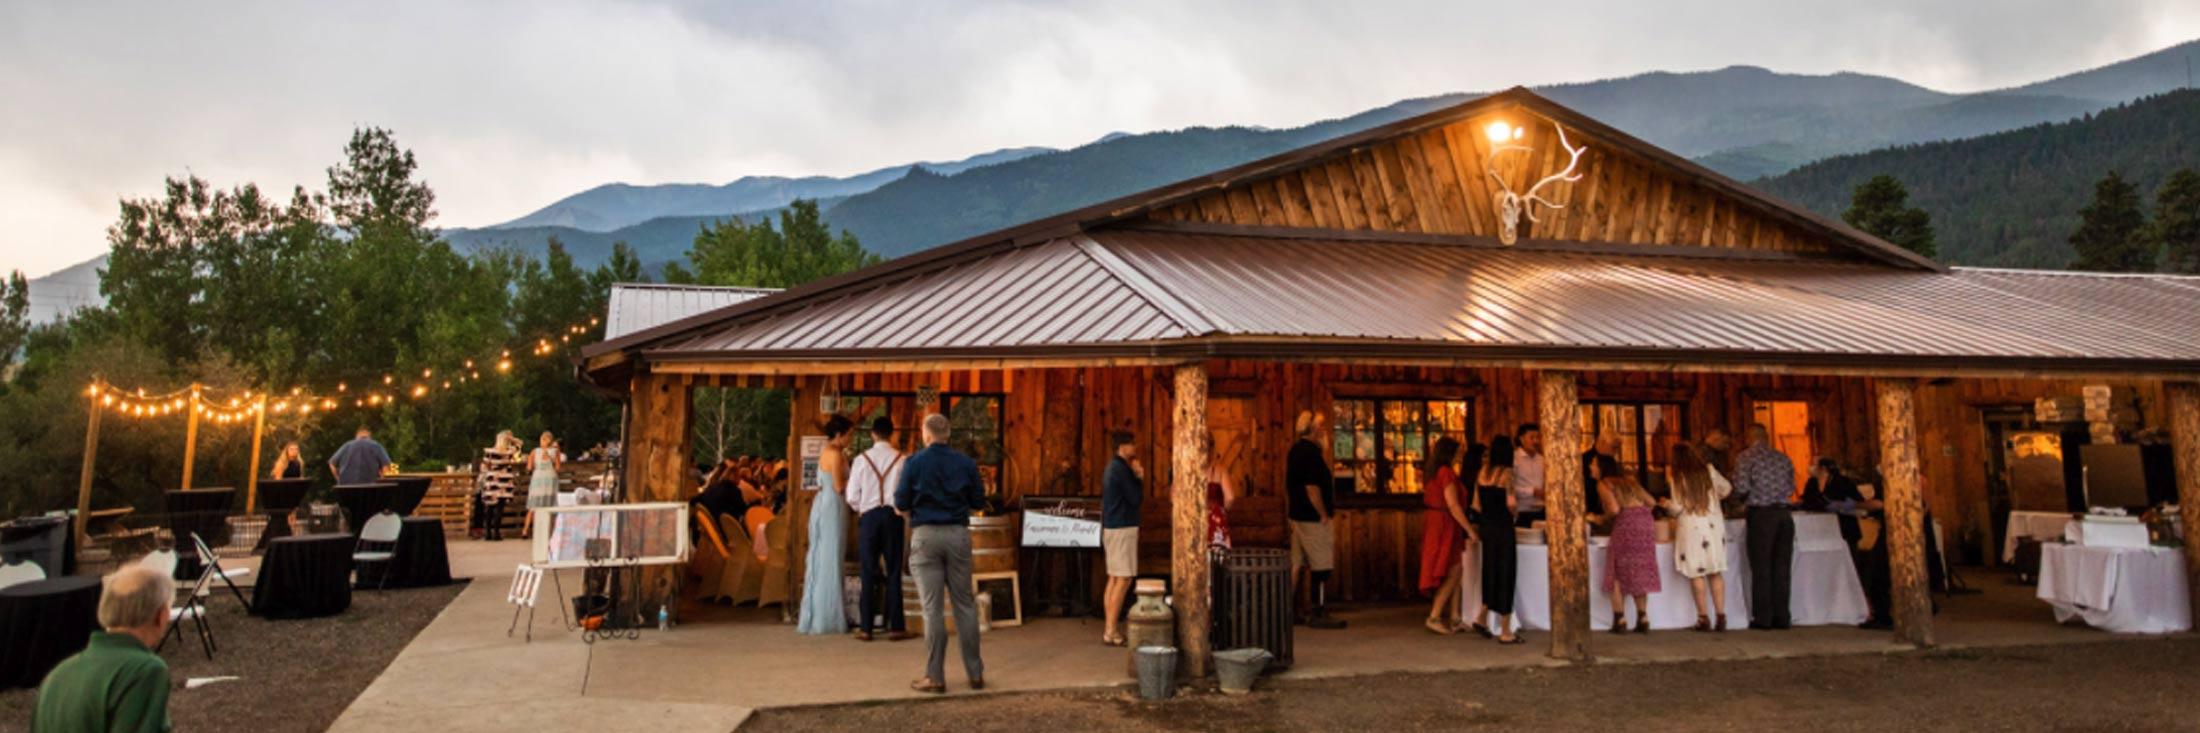 Colorado Mountain Ranch Barn Wedding Venue